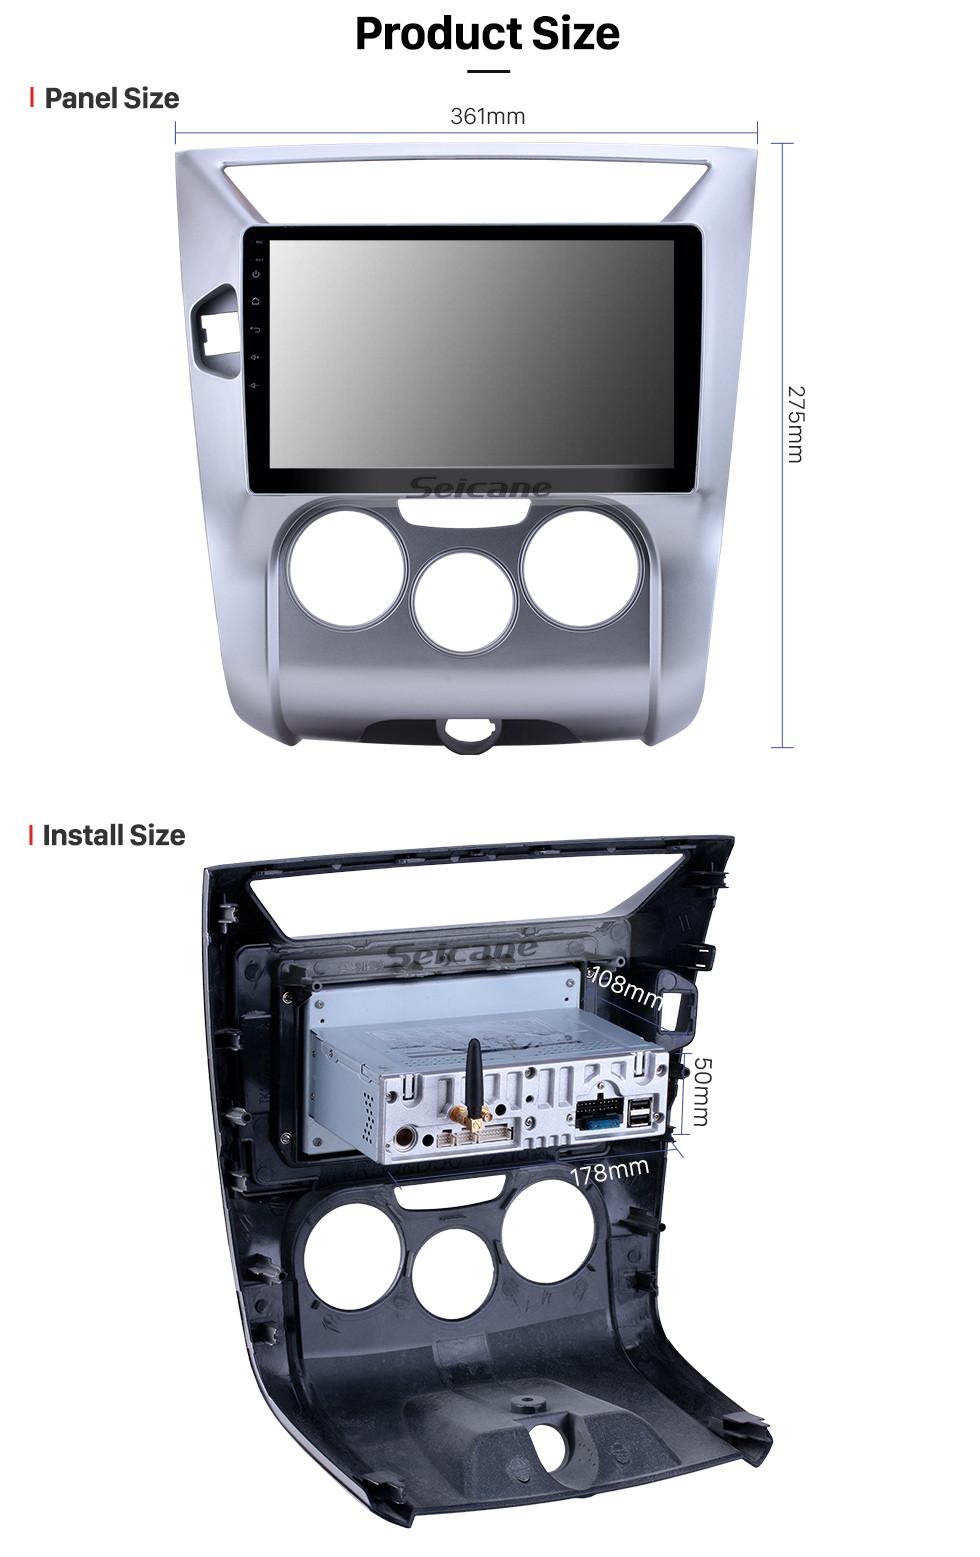 Seicane 10,1 дюйма 2012-2016 Venucia D50 / R50 Android 9.0 GPS навигация Радио WIFI Bluetooth HD с сенсорным экраном Поддержка Carplay Mirror Link